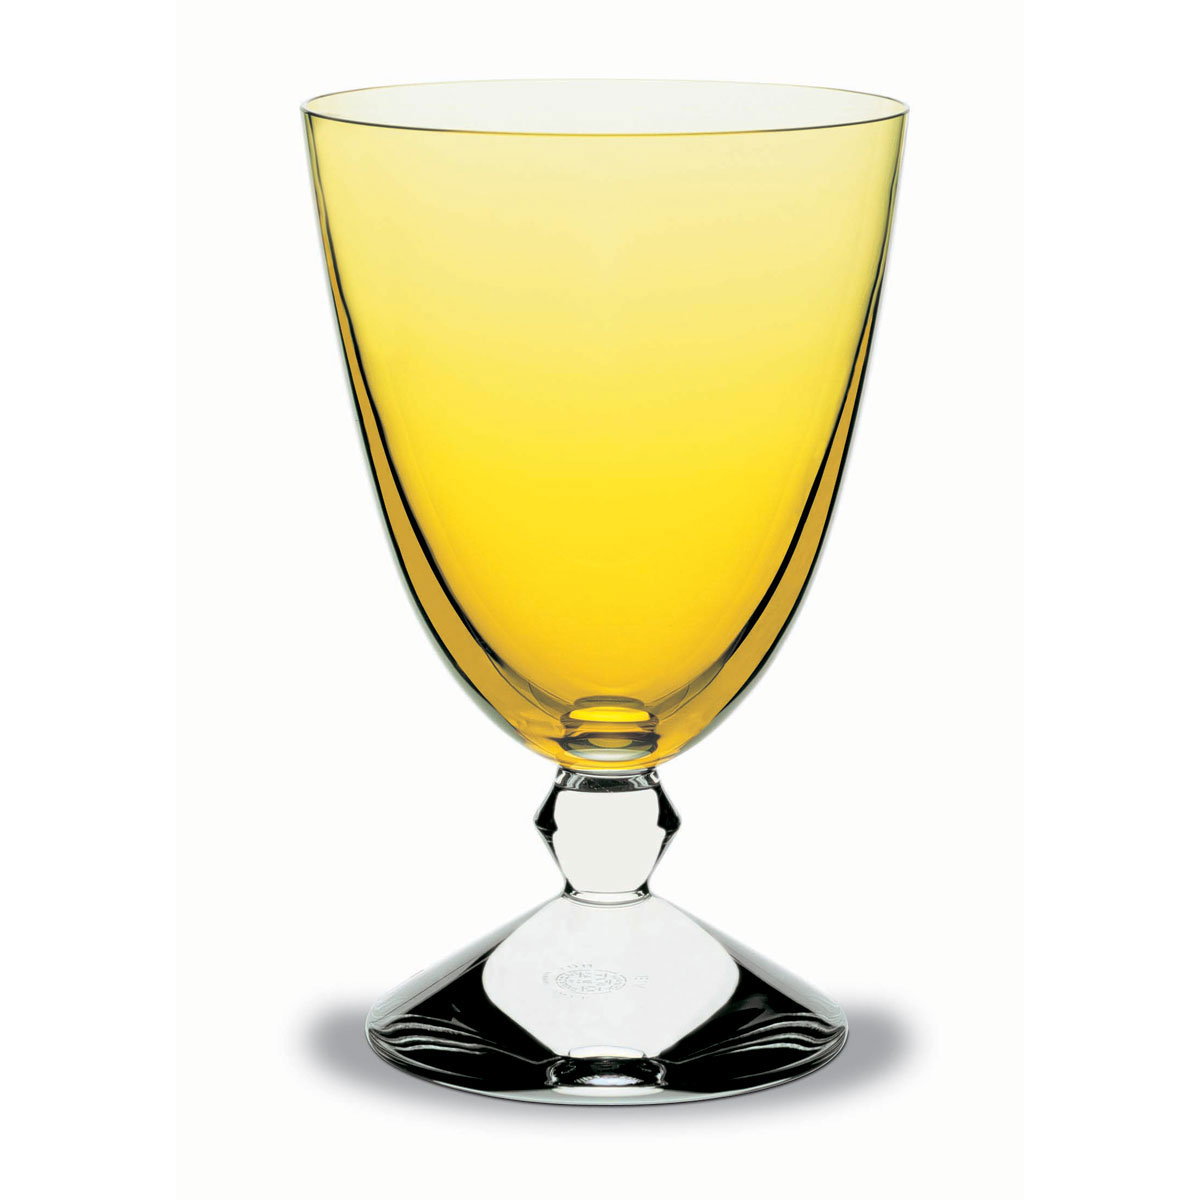 Baccarat Crystal, Vega Water Glass Amber, Single